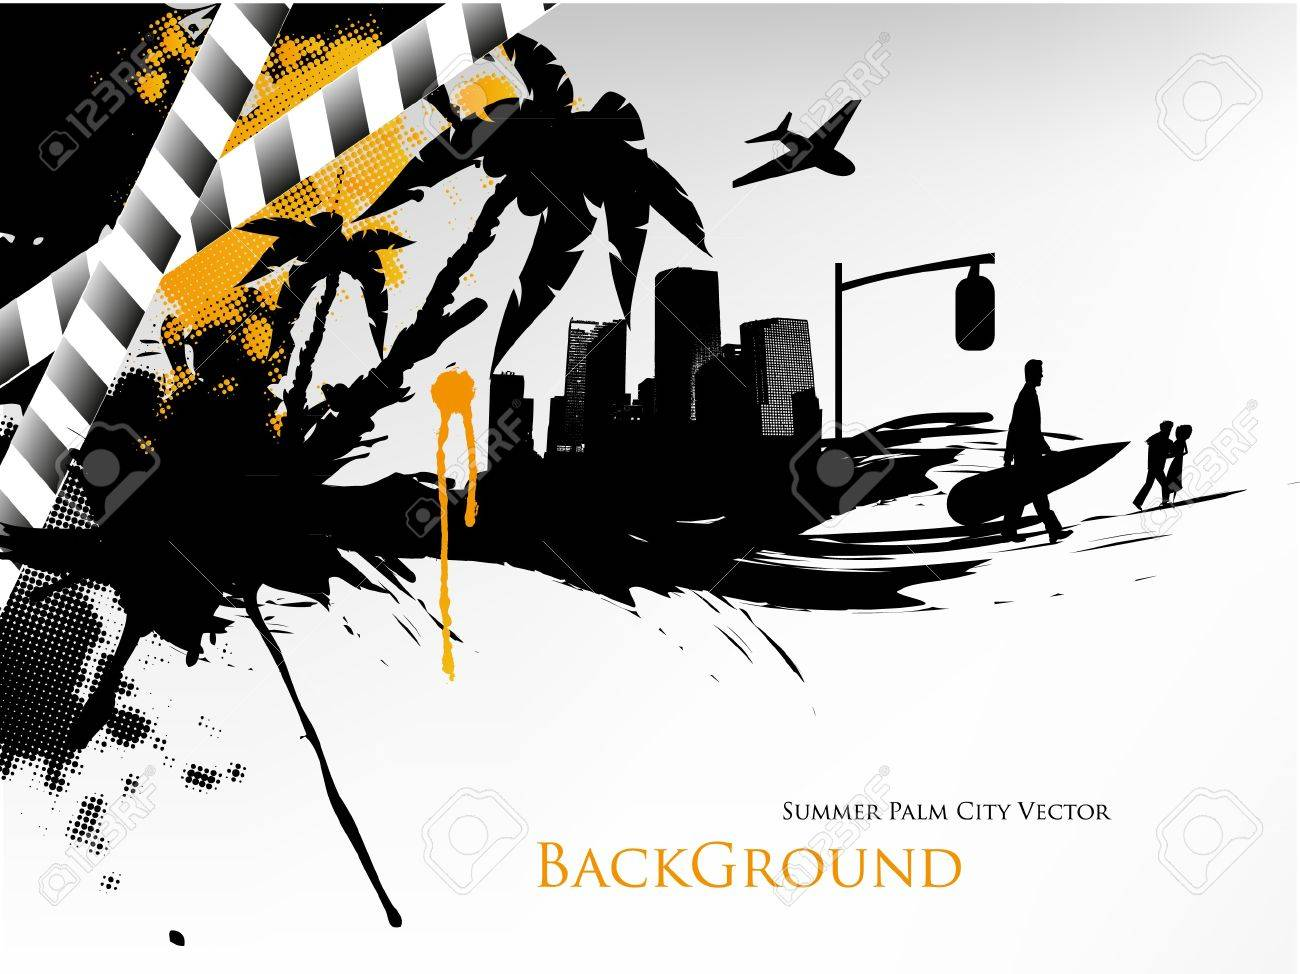 Summer Palm City Vector Illustration Stock Vector - 14127058